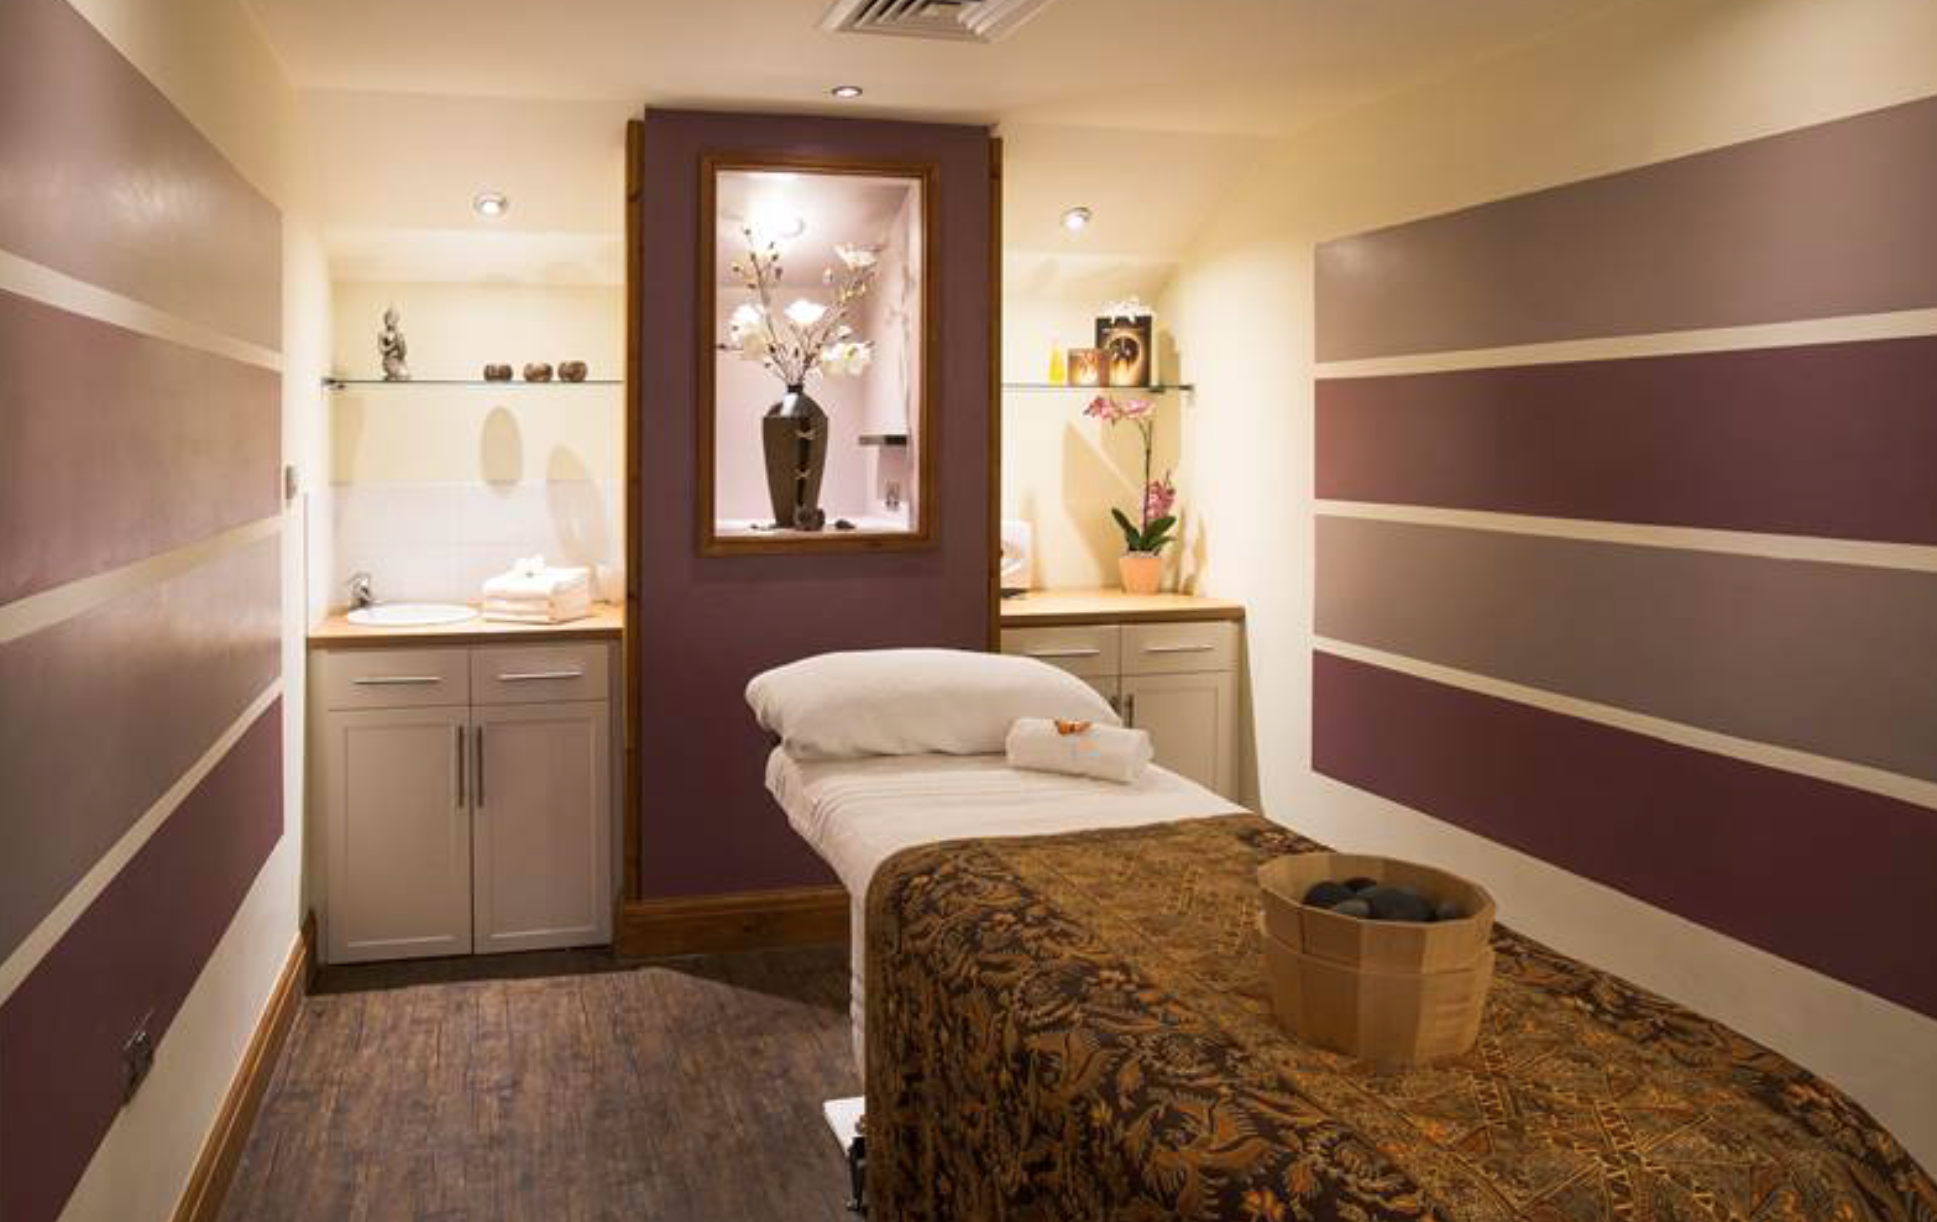 Spa Break At Last Drop Village - treatment room